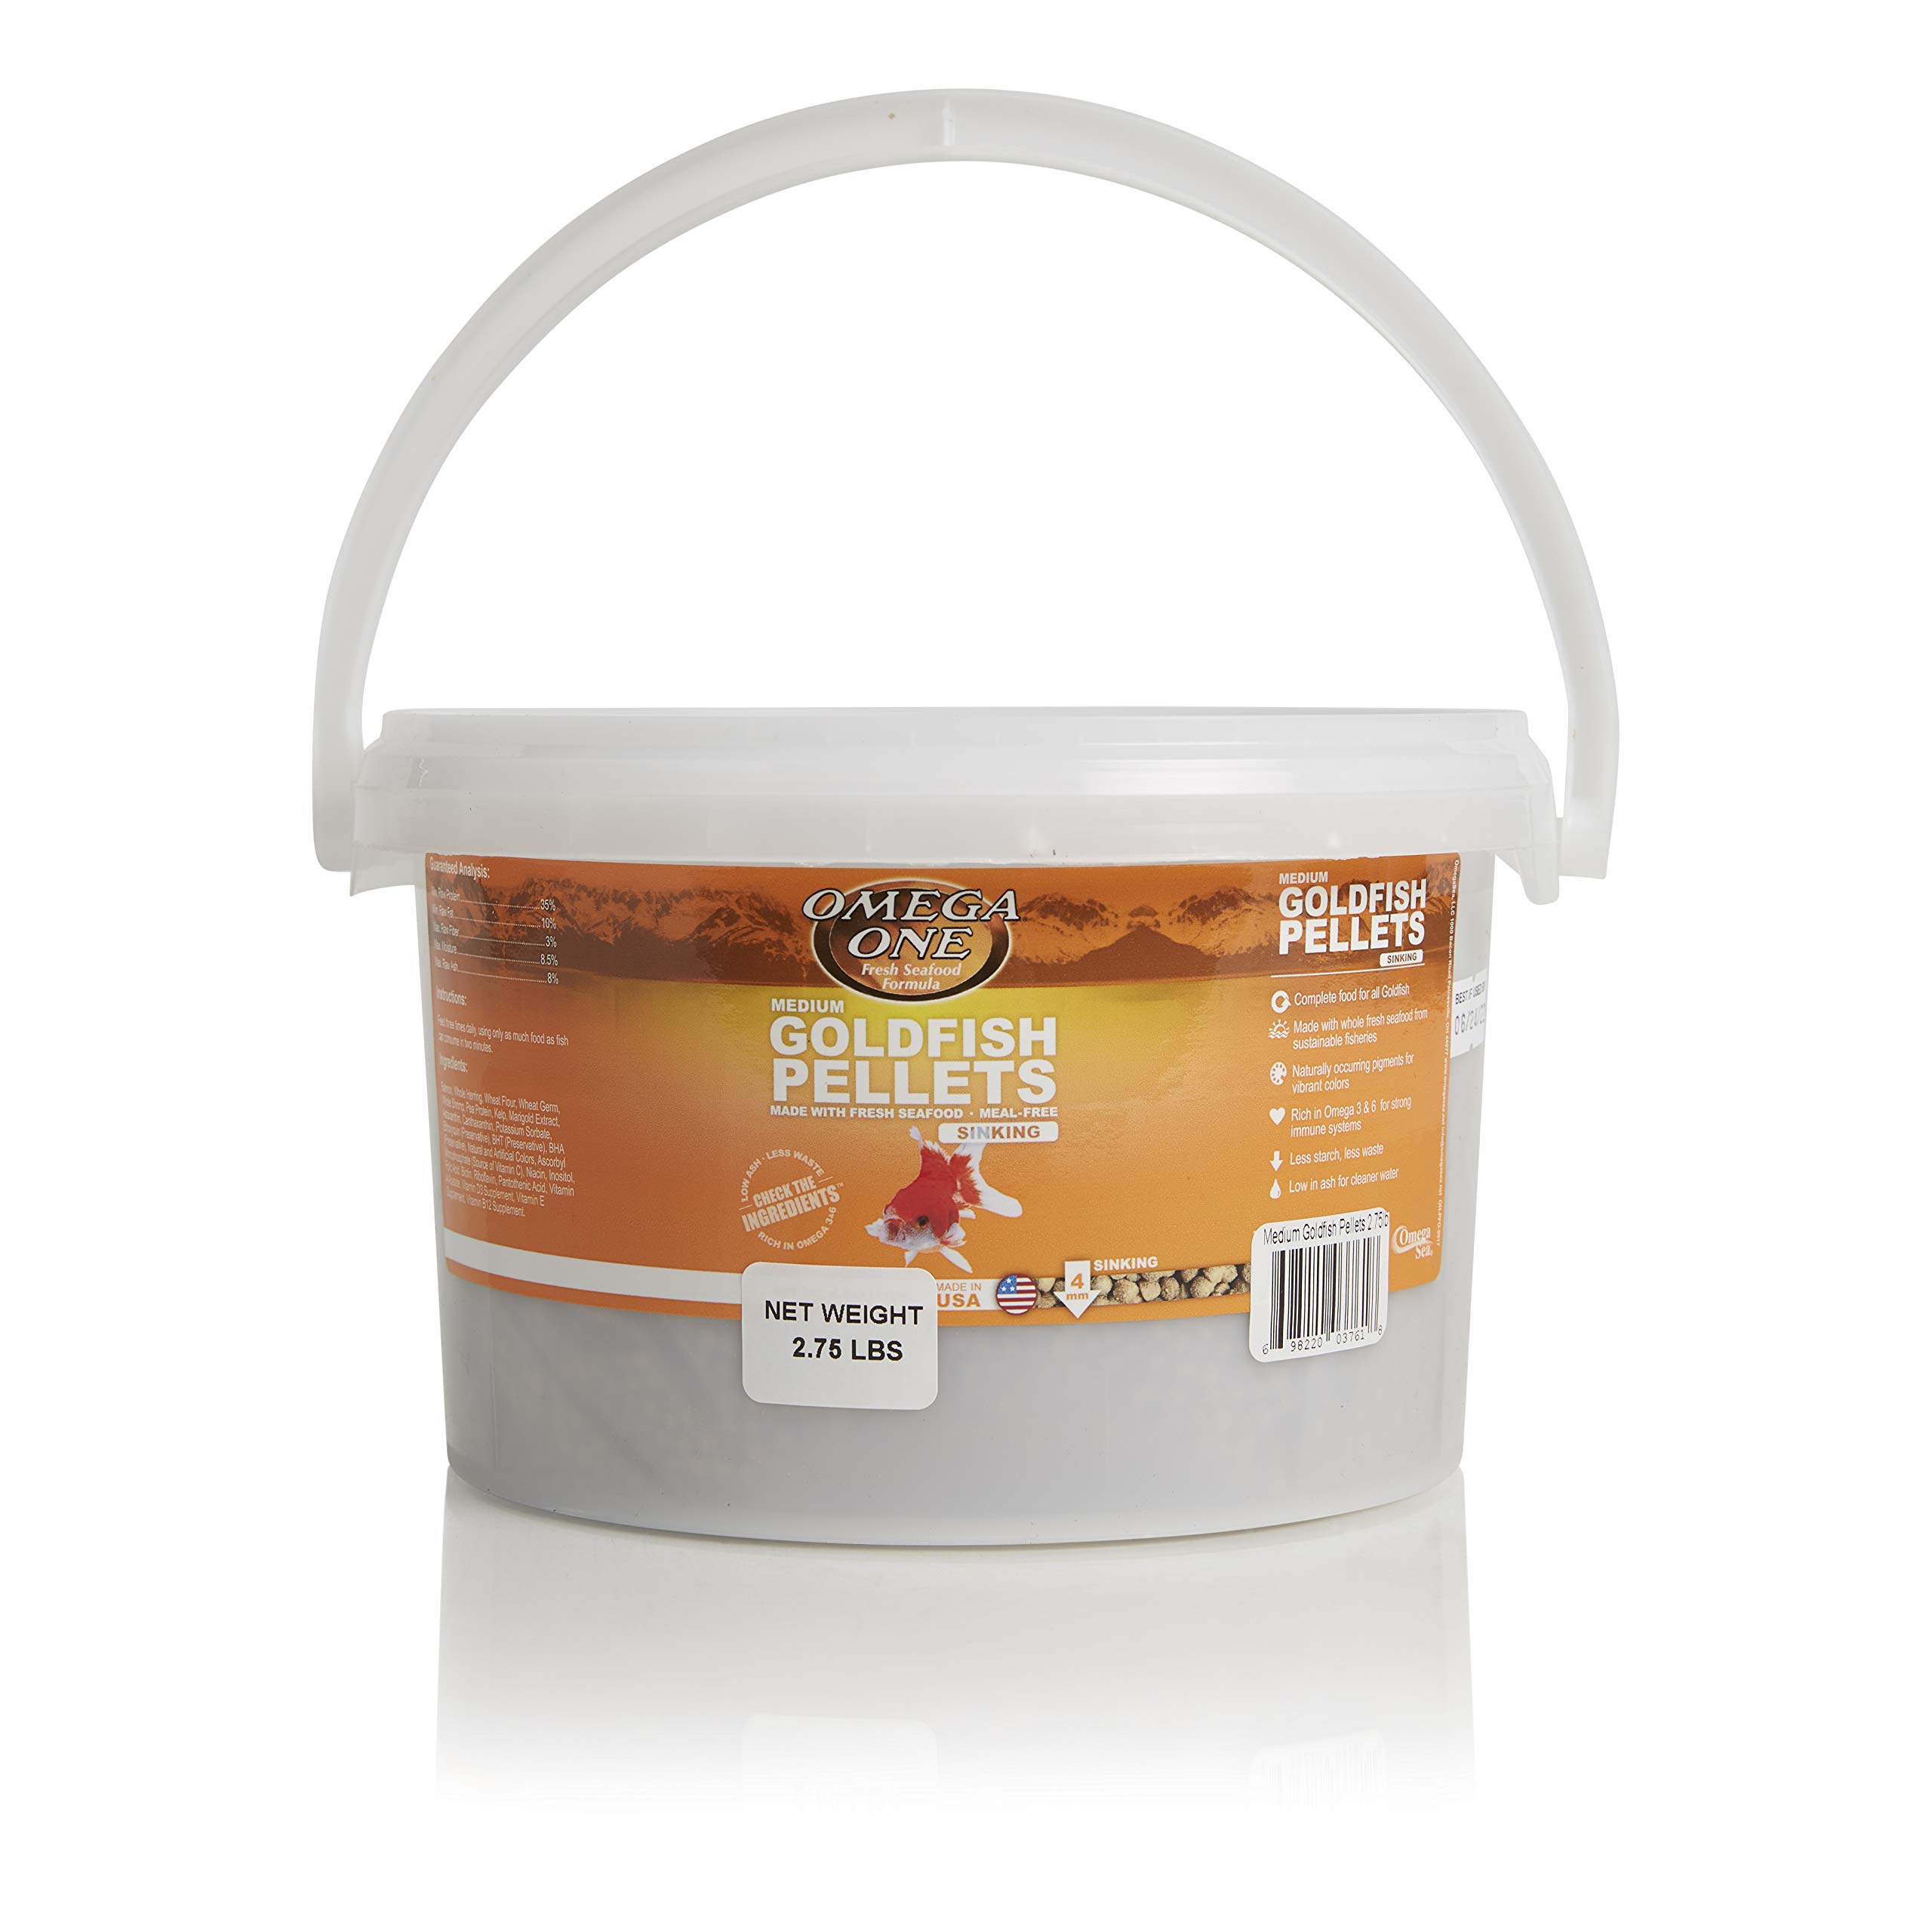 Omega One Goldfish Pellets, Sinking, 4mm Medium Pellets, 2.75 lb Bucket by Omega One